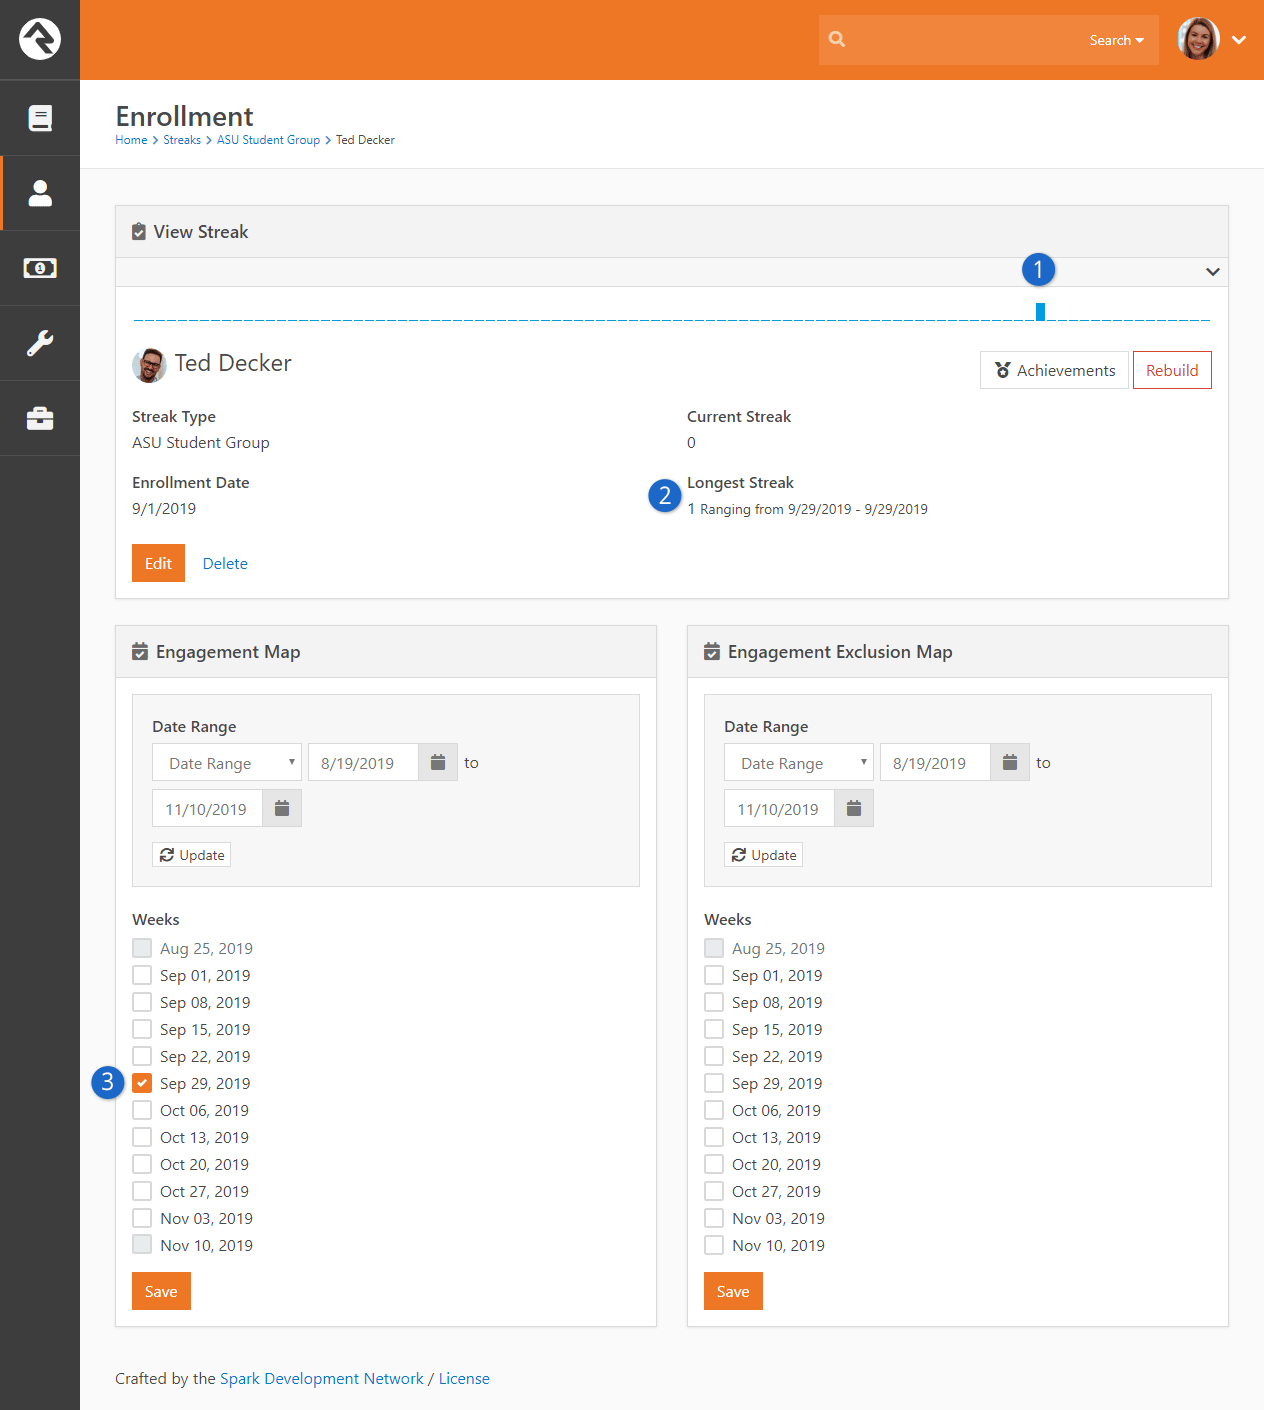 Enrollment Detail Page - Manual